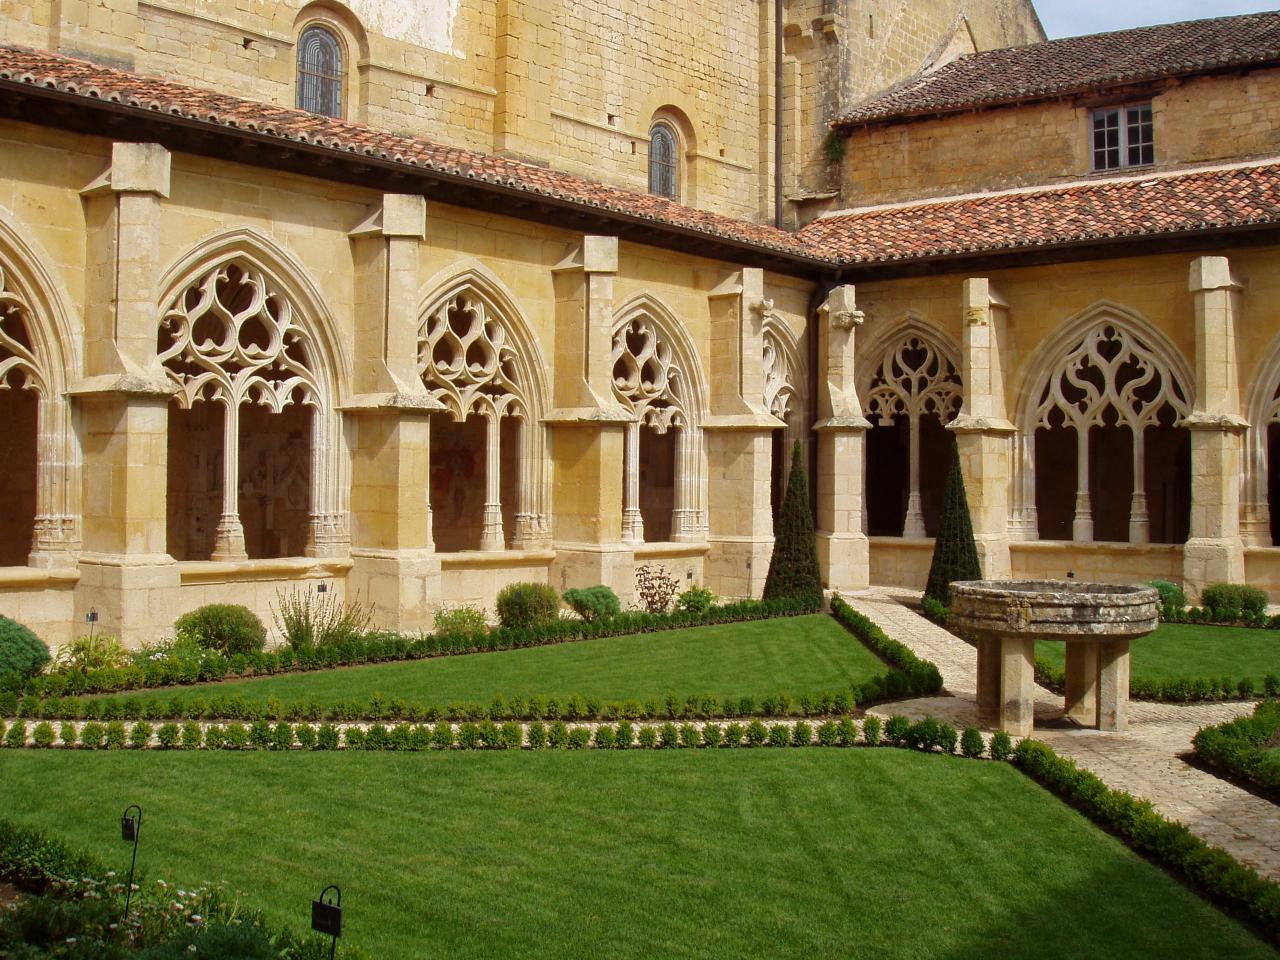 Cadouin l'abbaye